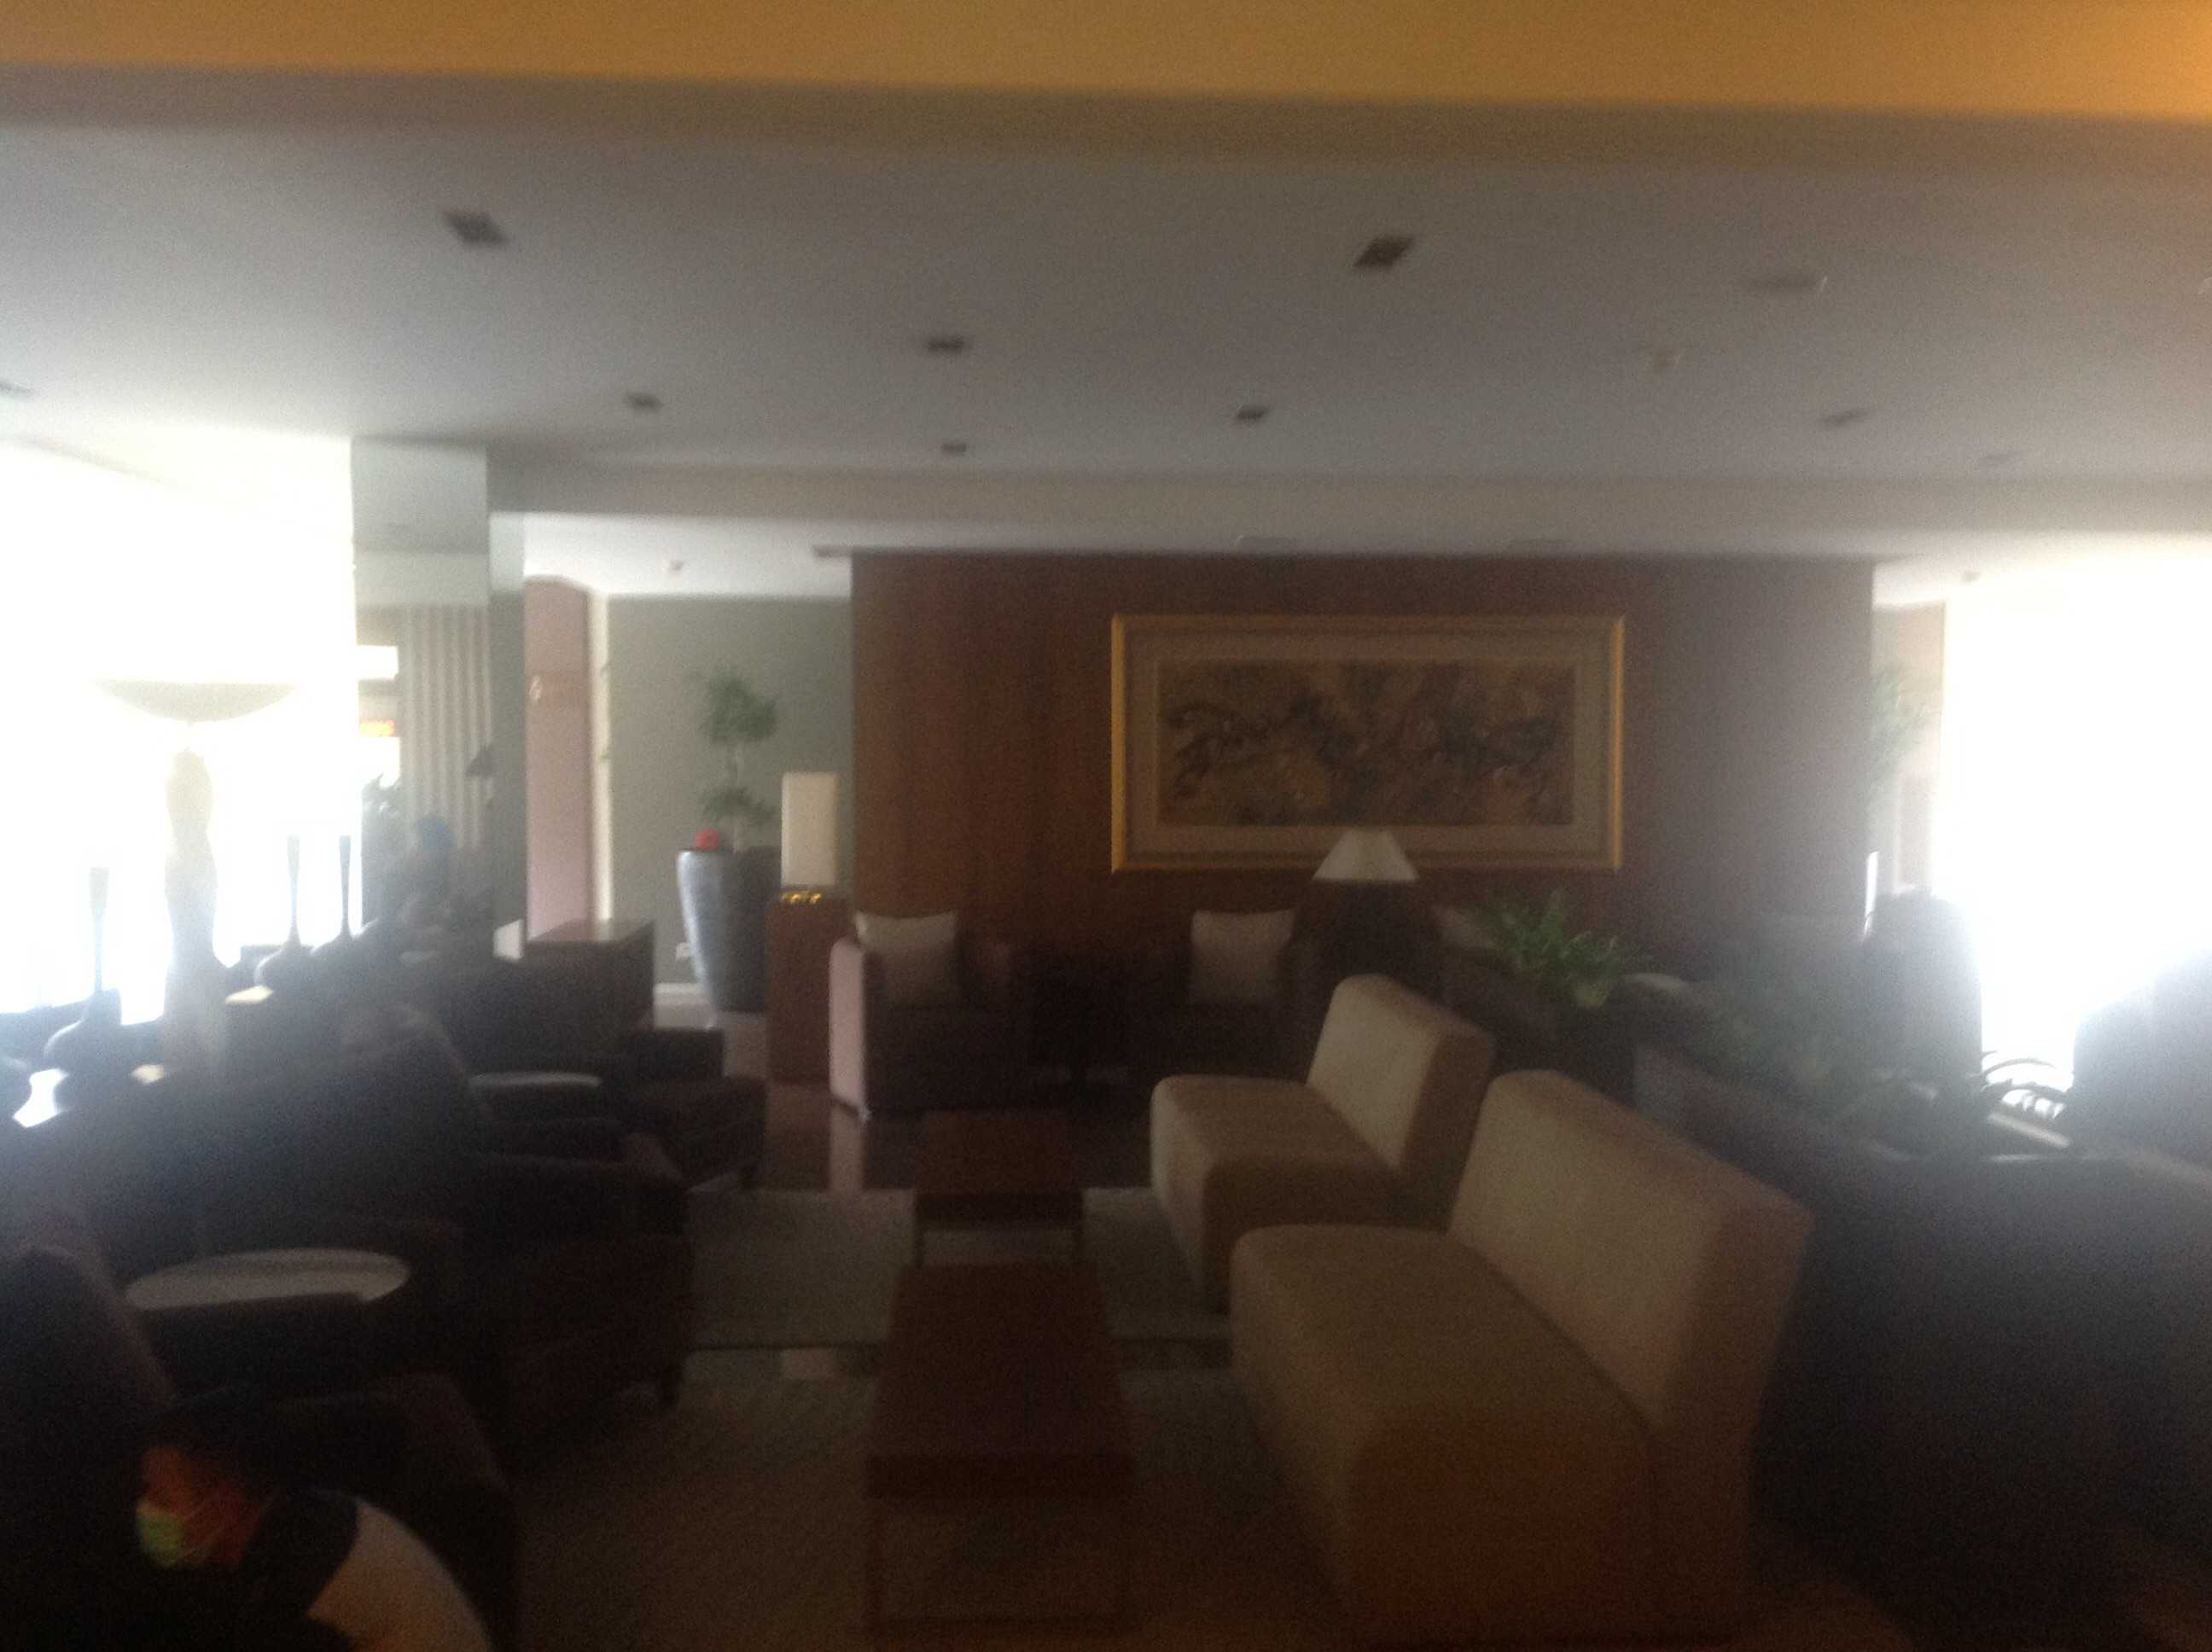 Pt.buana Pratama Interindo Erha Kemanggisan Jakarta, Daerah Khusus Ibukota Jakarta, Indonesia Jakarta, Daerah Khusus Ibukota Jakarta, Indonesia Image1   46368